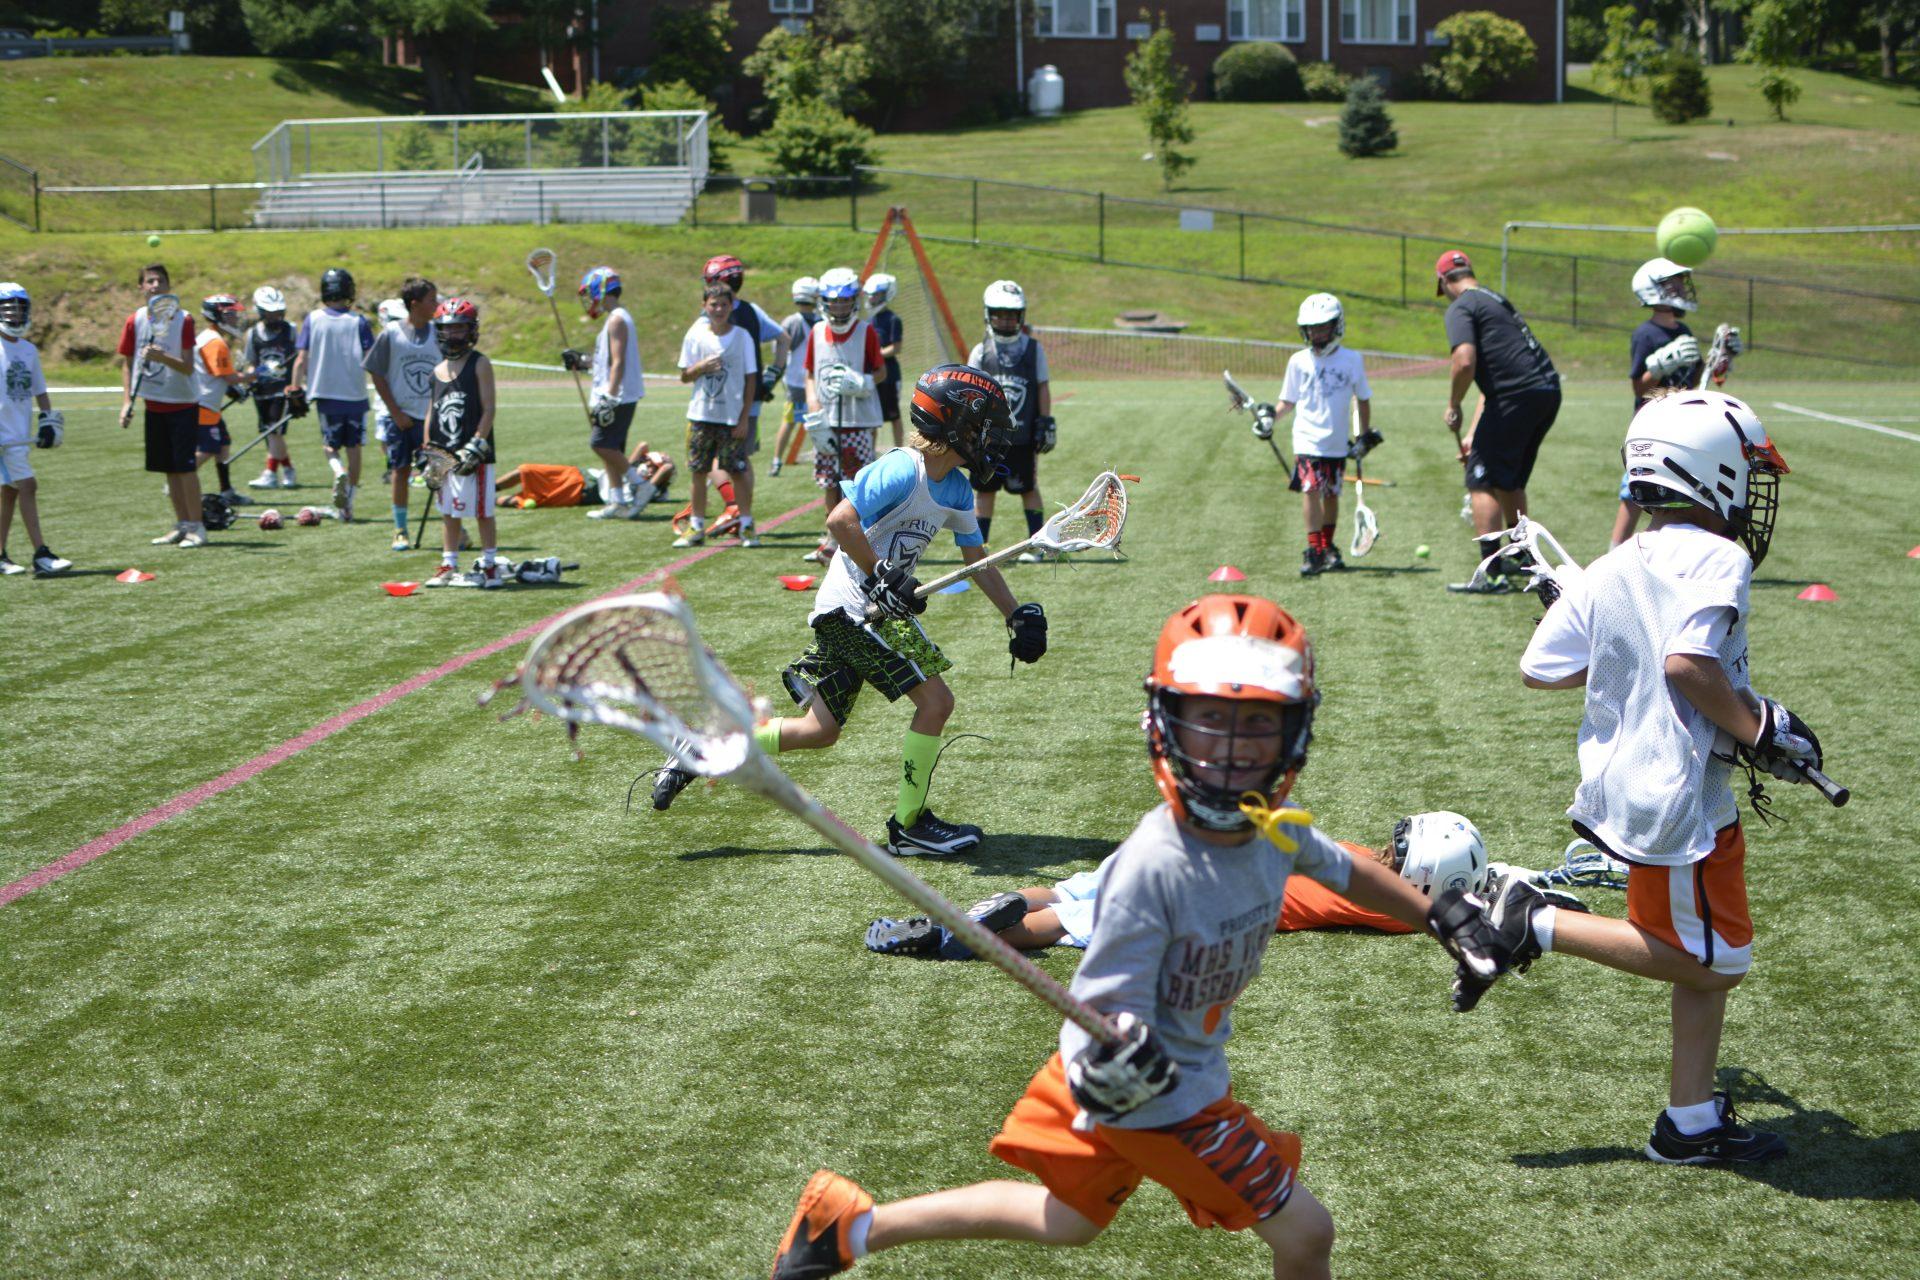 New Jersey Lacrosse Camp Fun